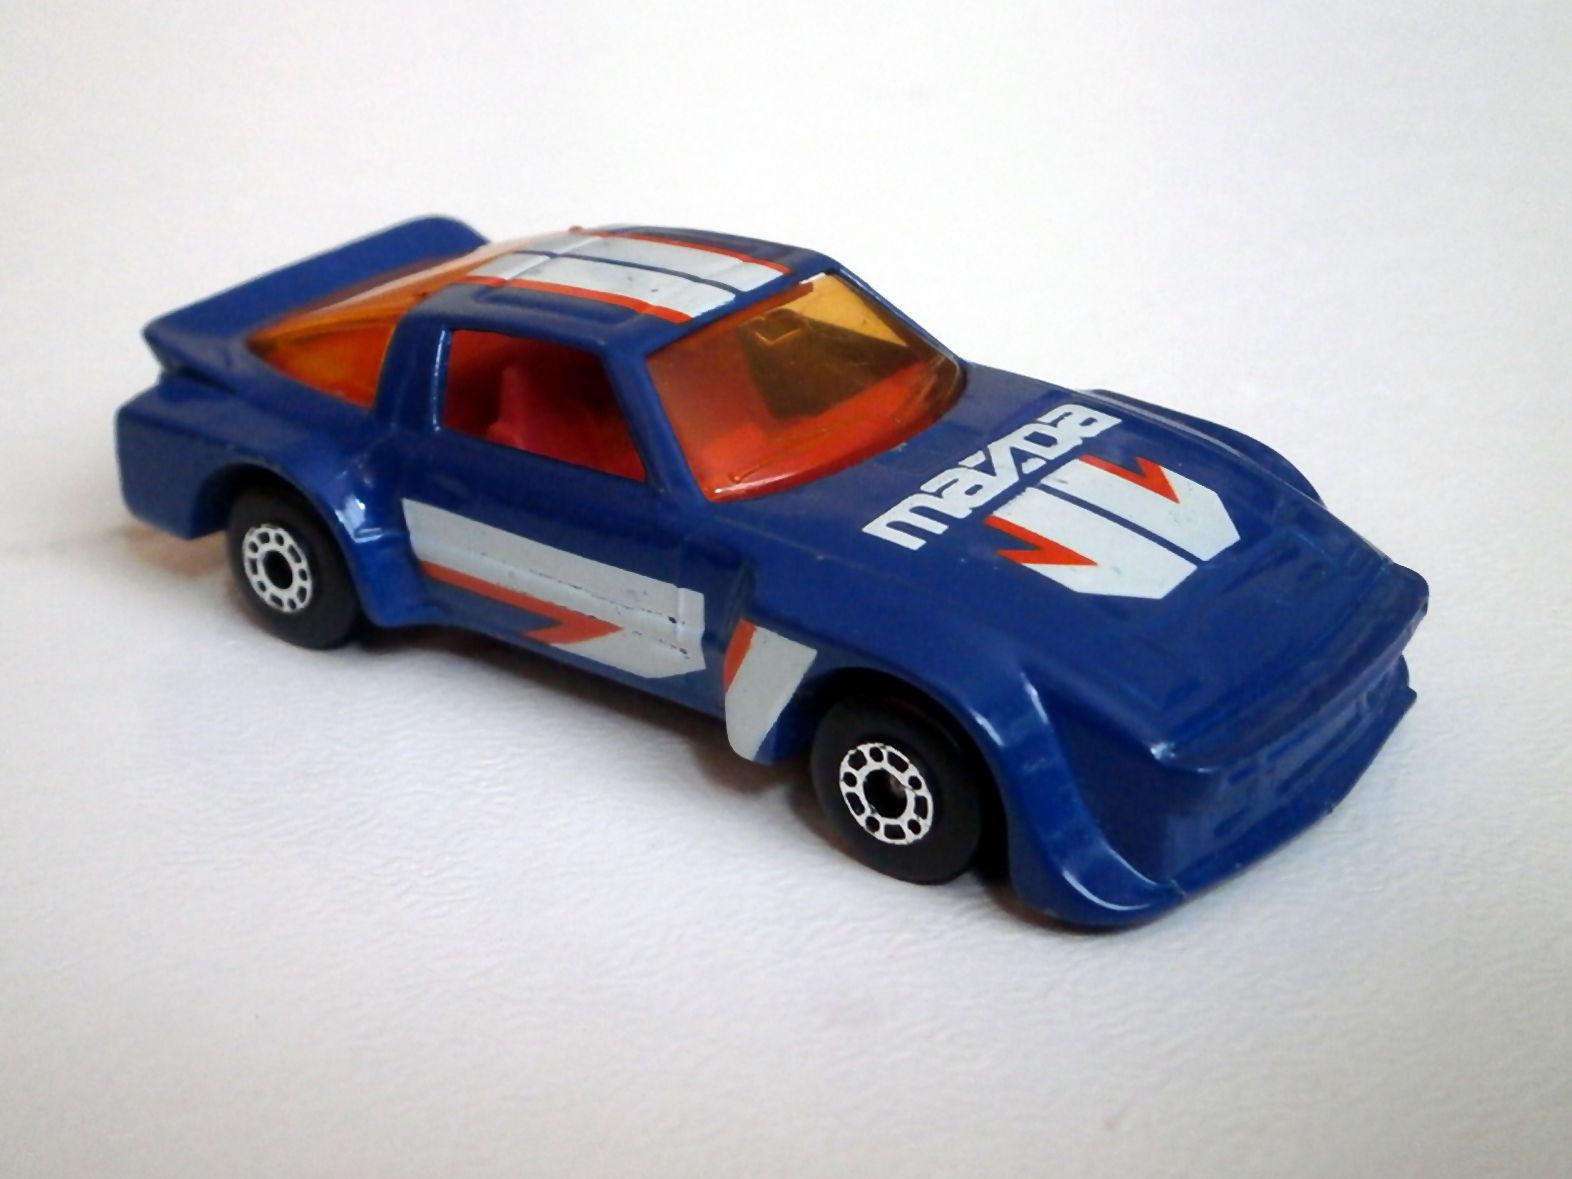 Superieur IMSA Mazda RX 7 1983